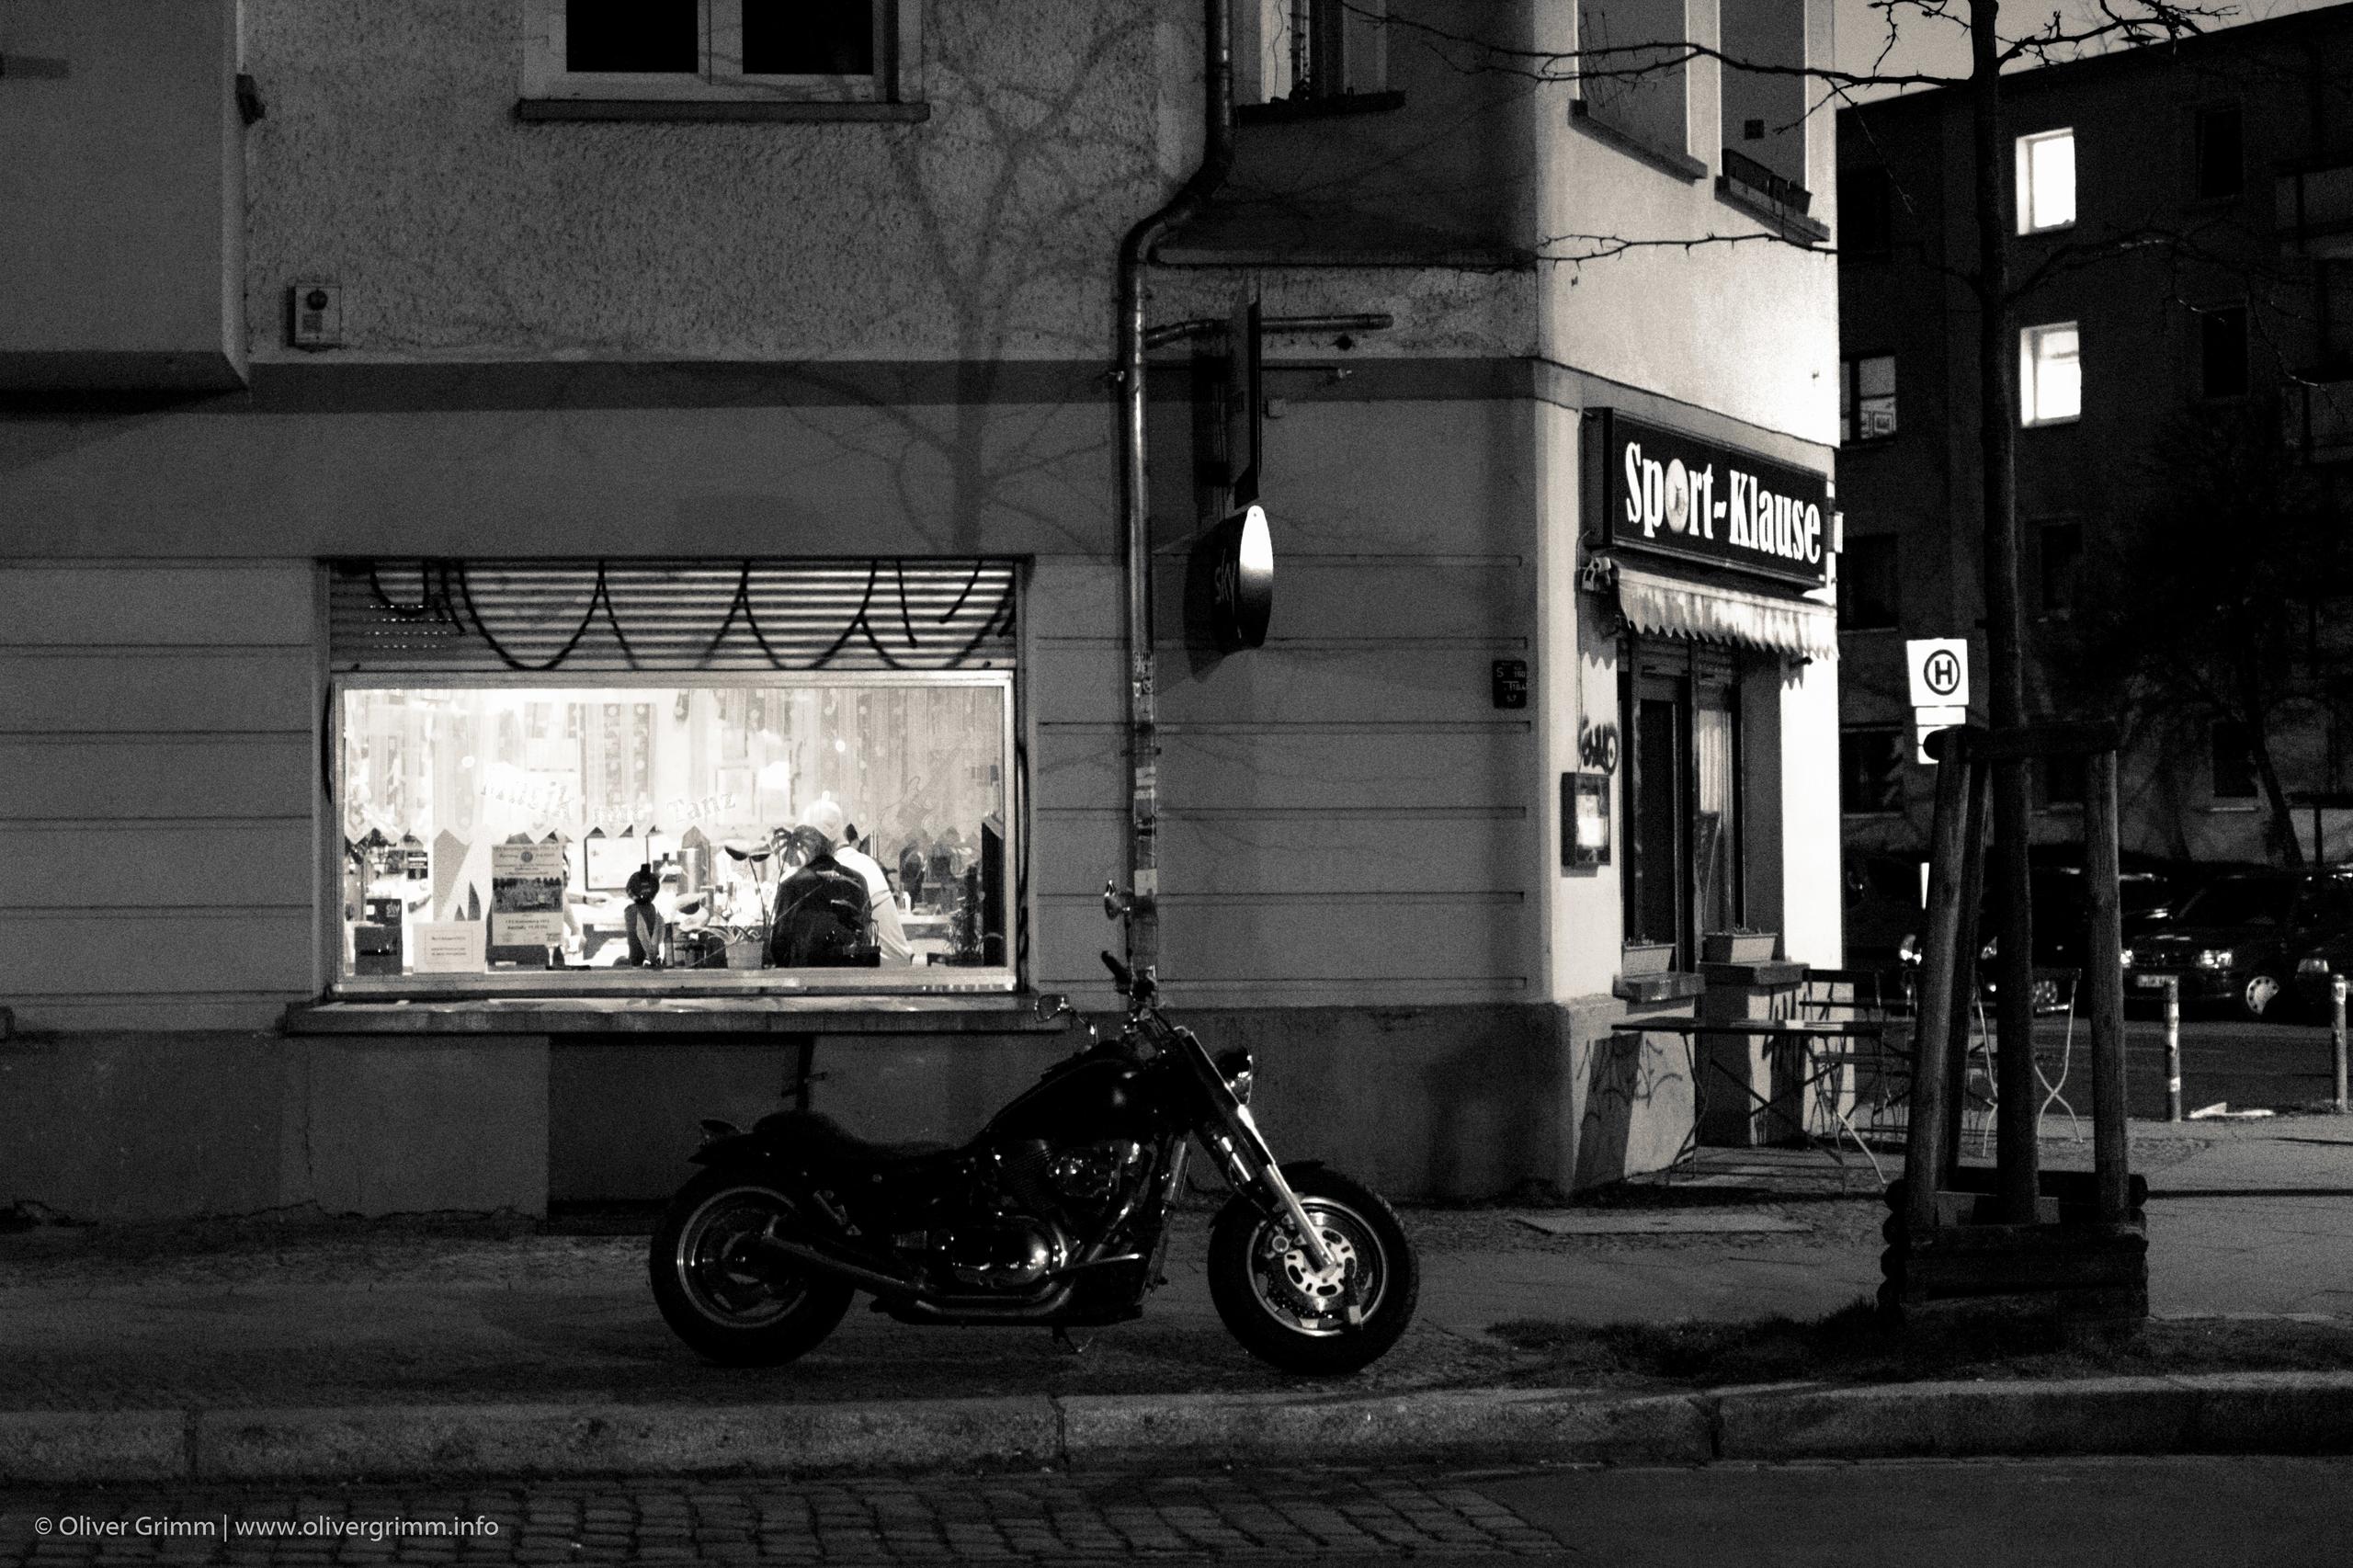 2016-04-03_Sport-Klause_Rollei_mid.jpg